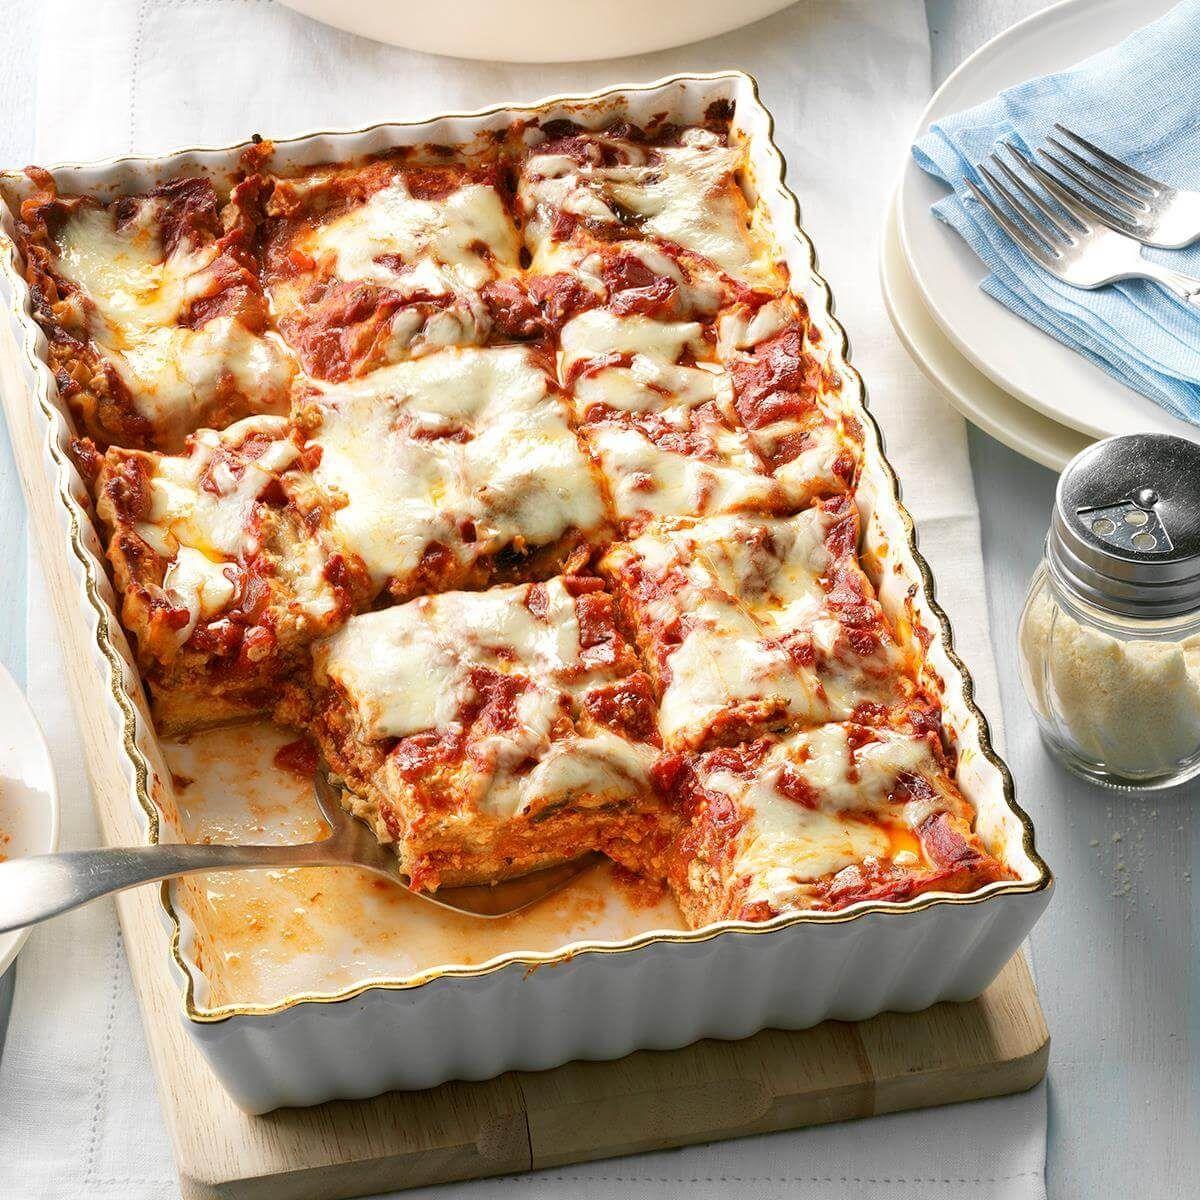 How To Reheat Lasagna So It Tastes Delicious In 2021 How To Reheat Lasagna Food Recipes